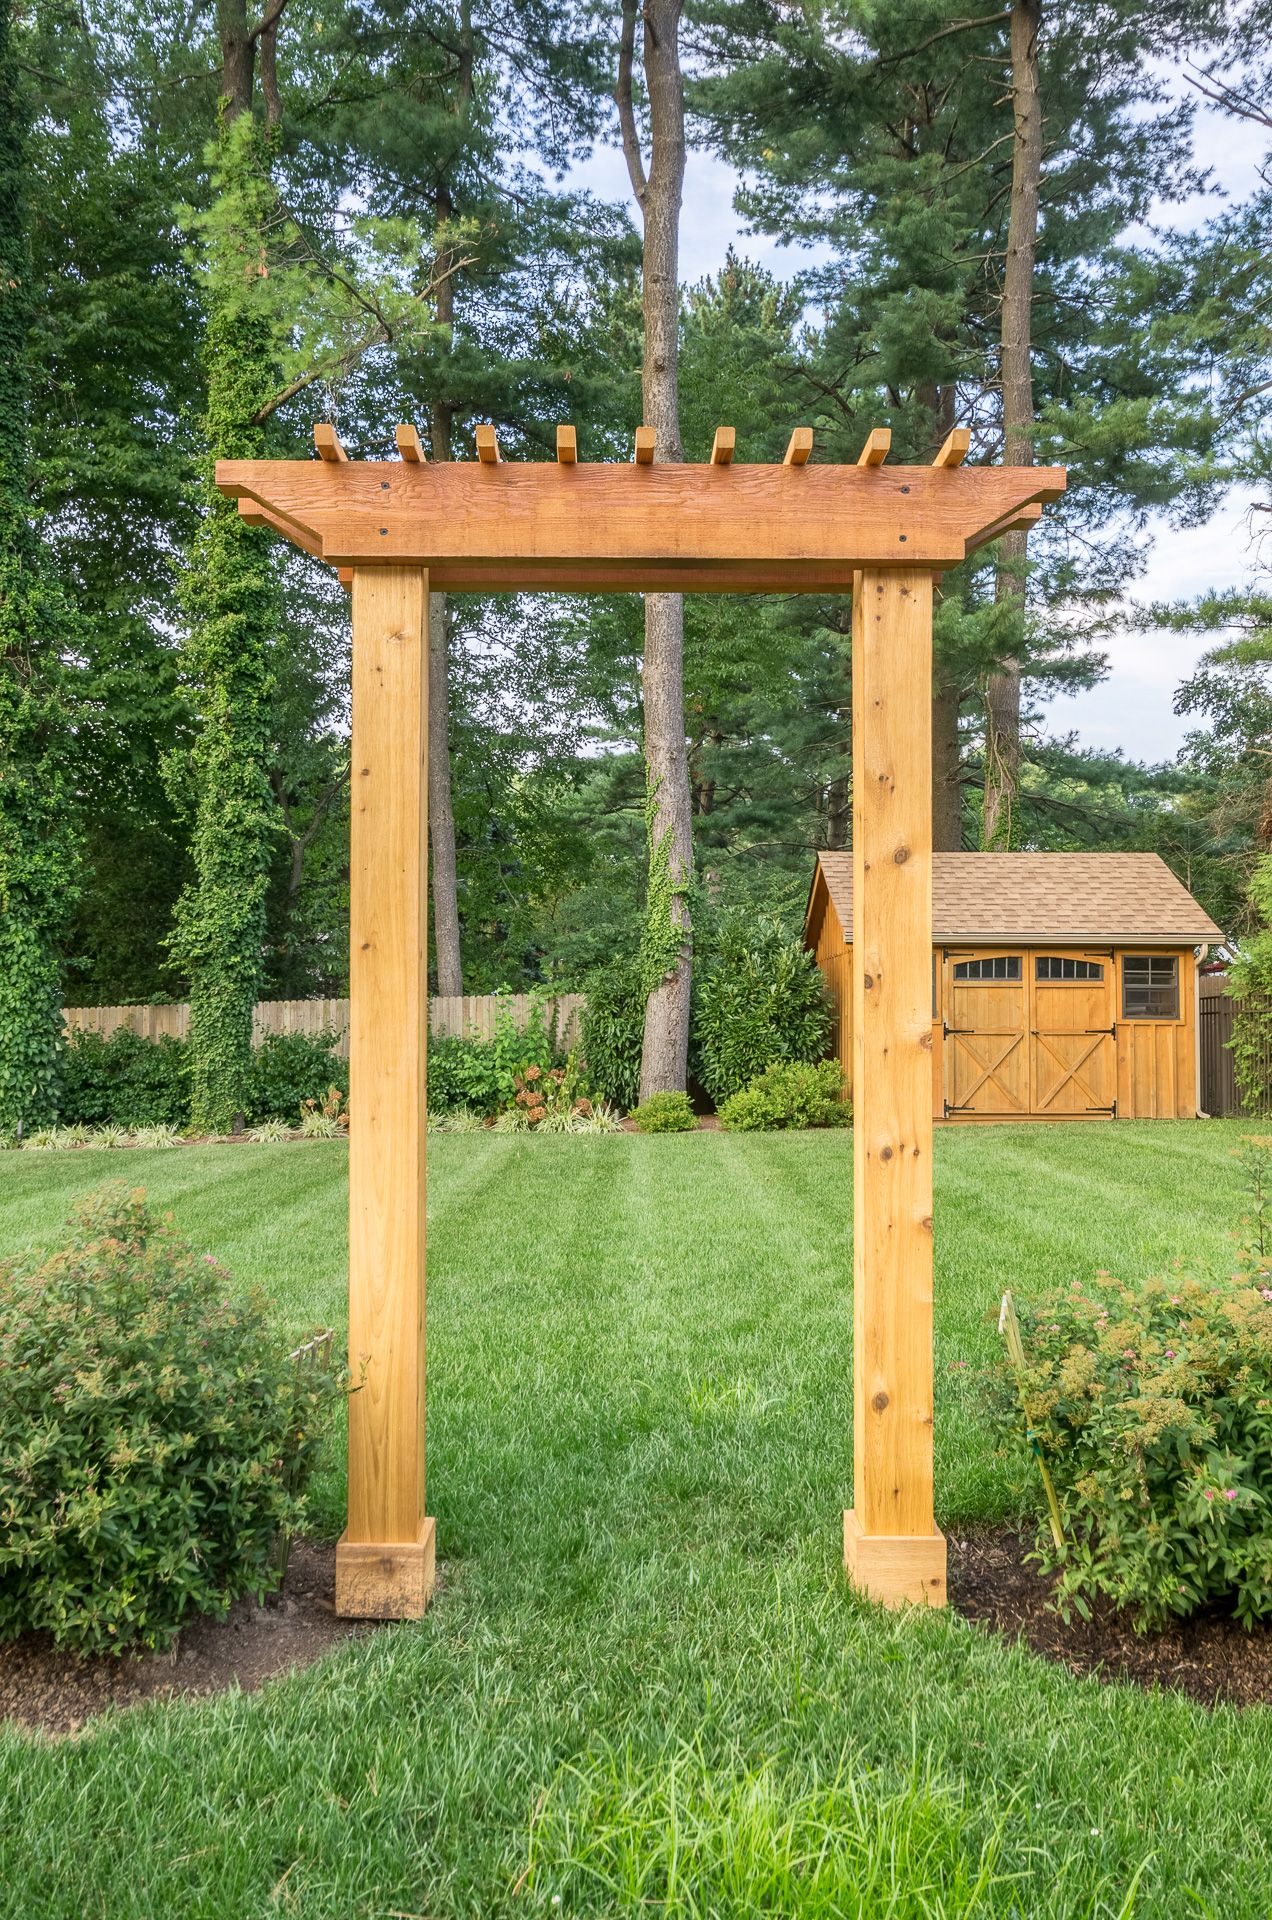 Outdoor Living | Outdoor living design, Four season ... on 4 Seasons Outdoor Living id=33219